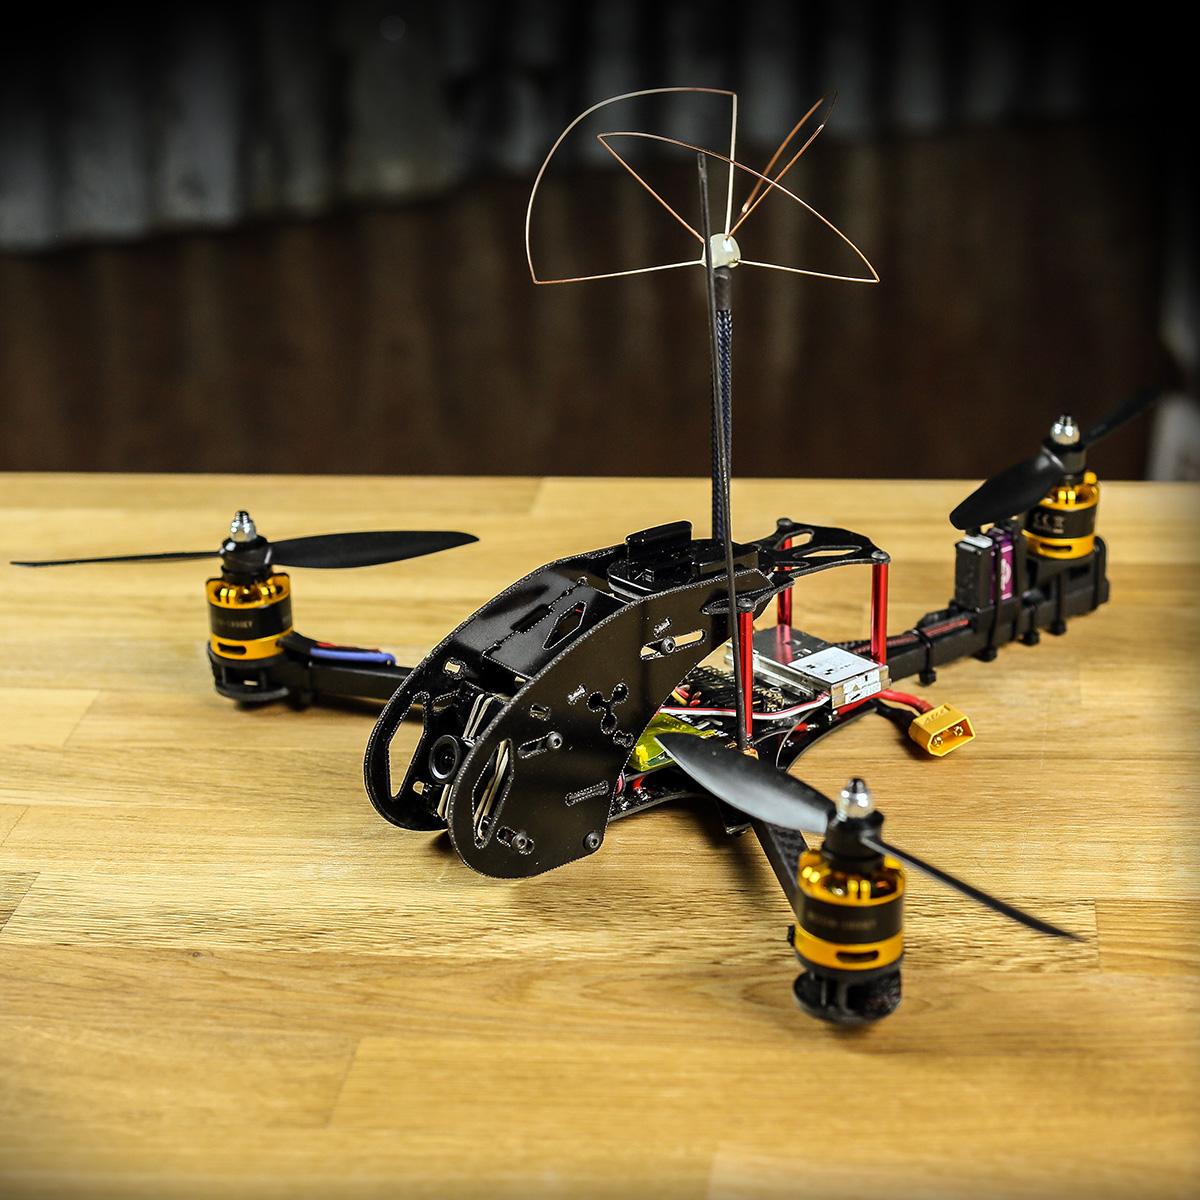 MiniTri & Mini Tricopter thoughts u2013 need feedback u2013 RCExplorer